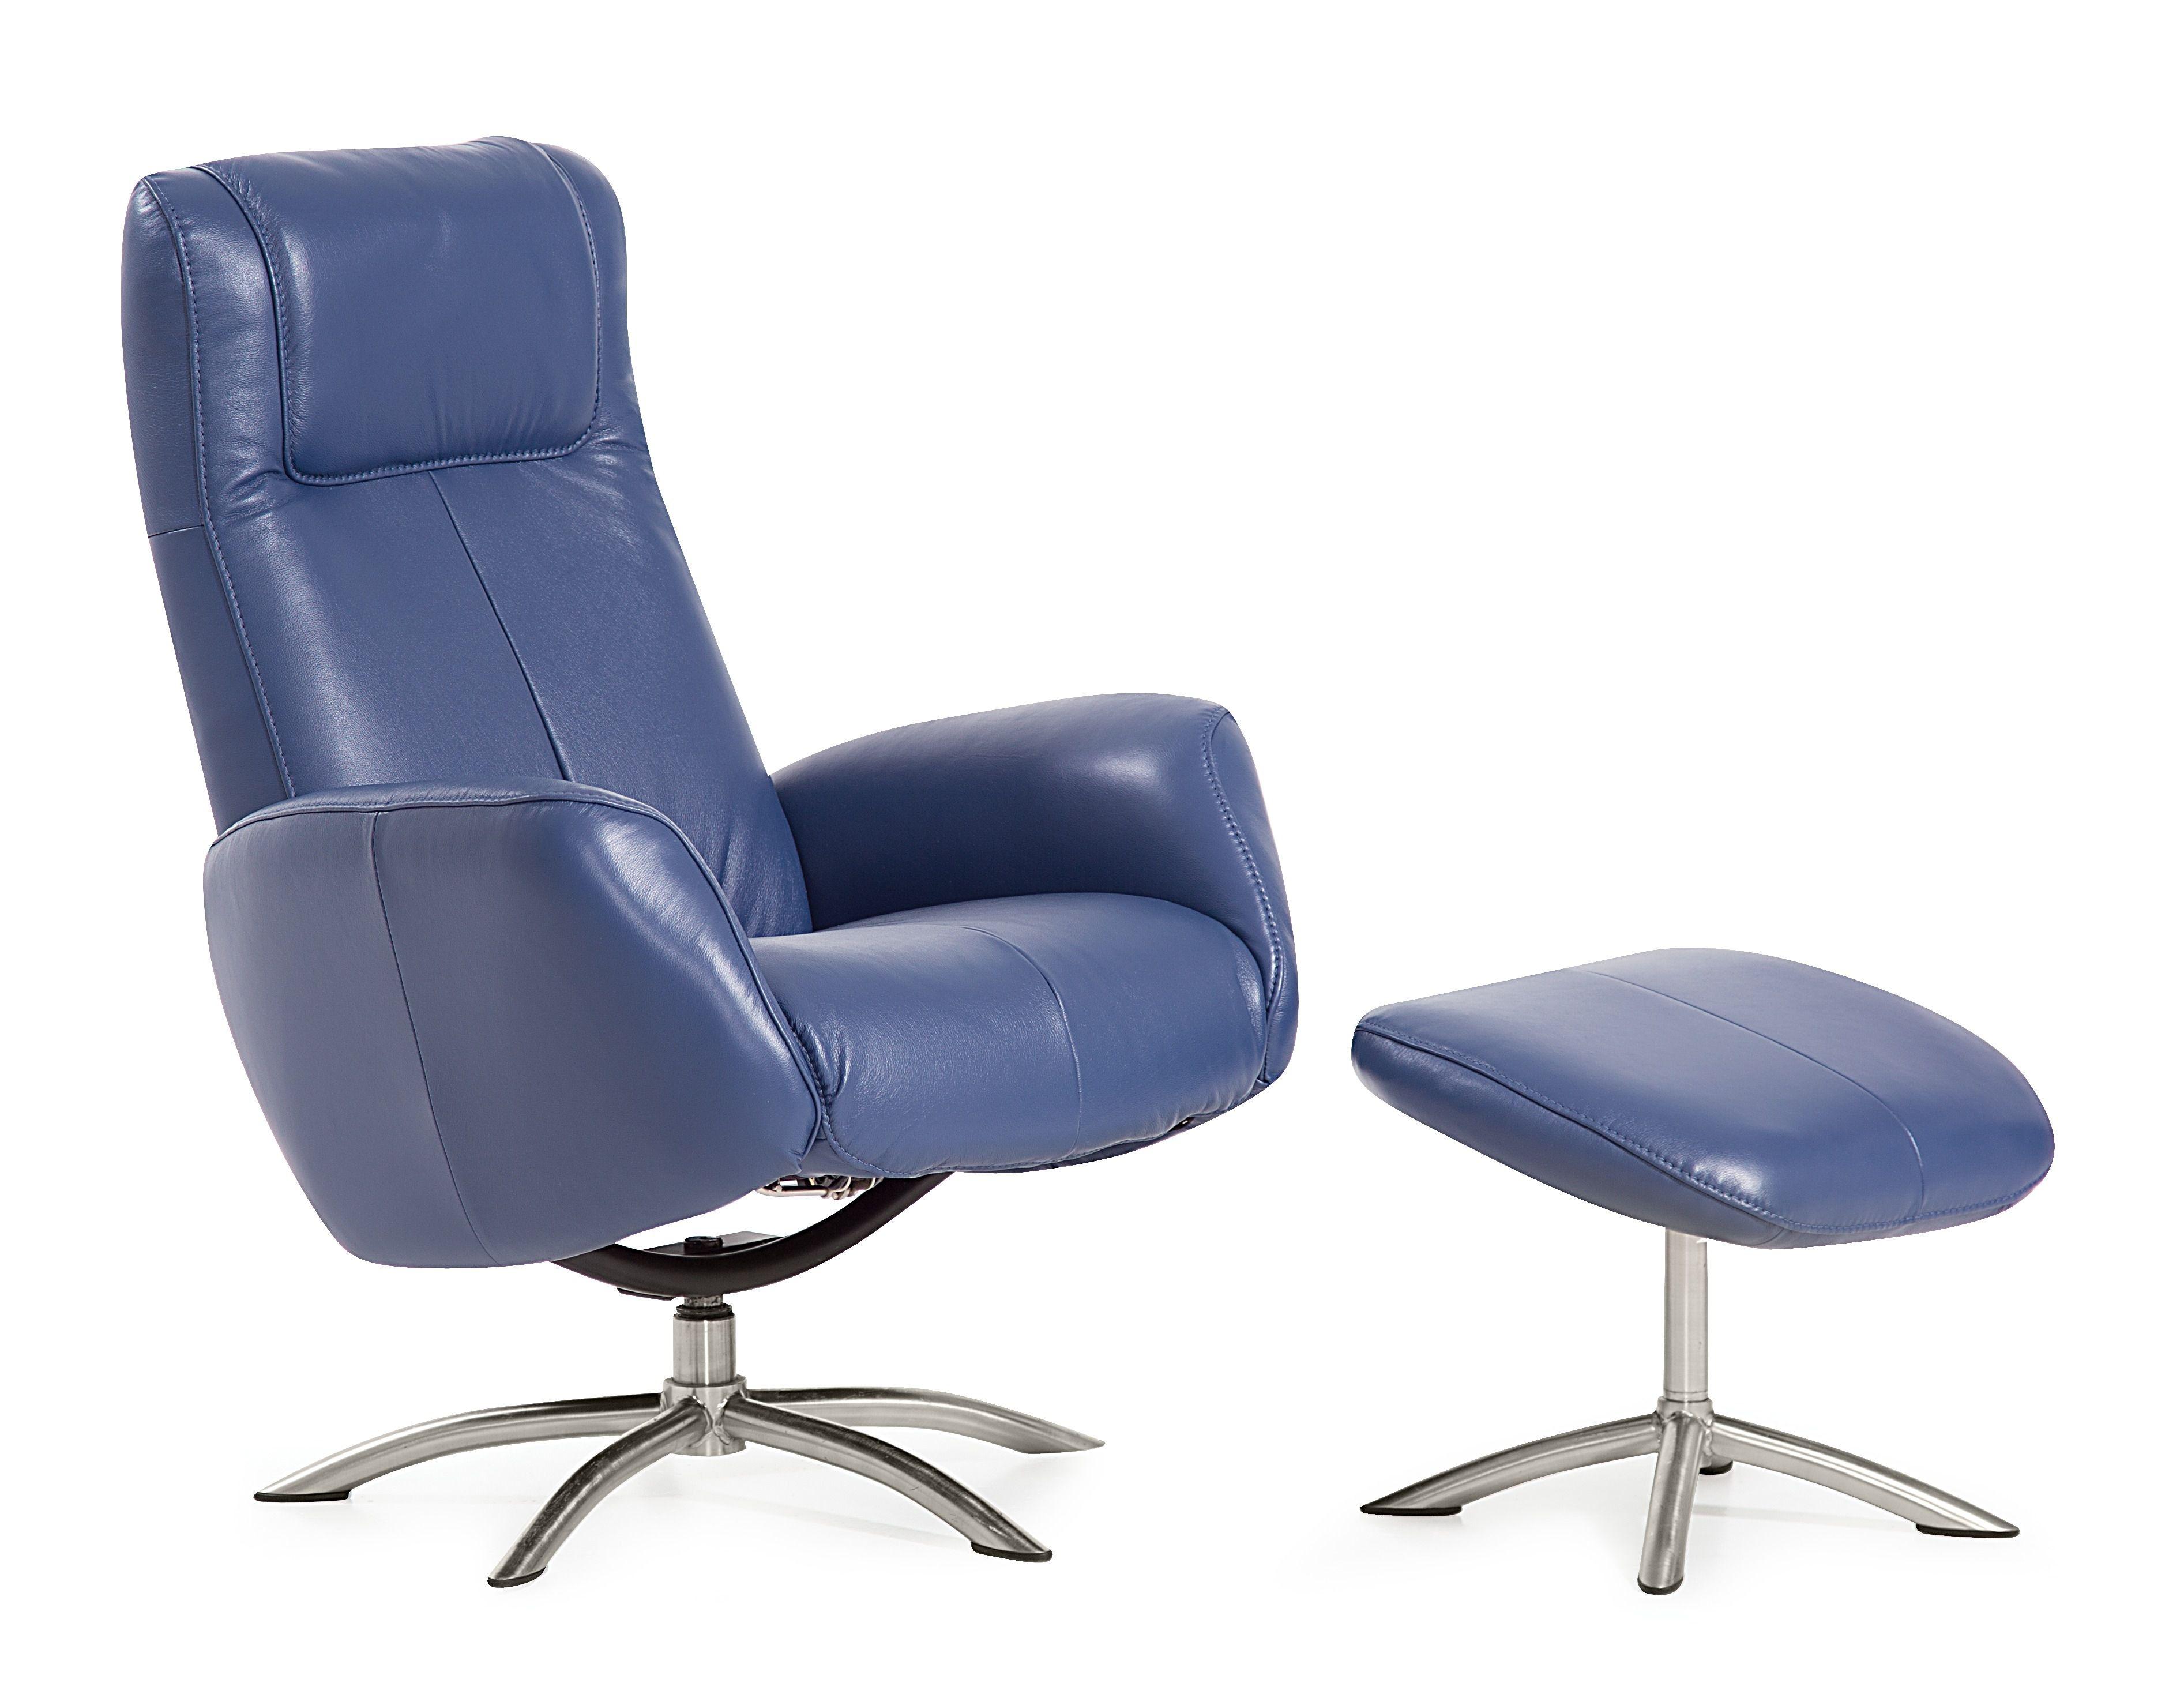 palliser furniture living room chair 50005 02 furniture forever rh furnitureforever com